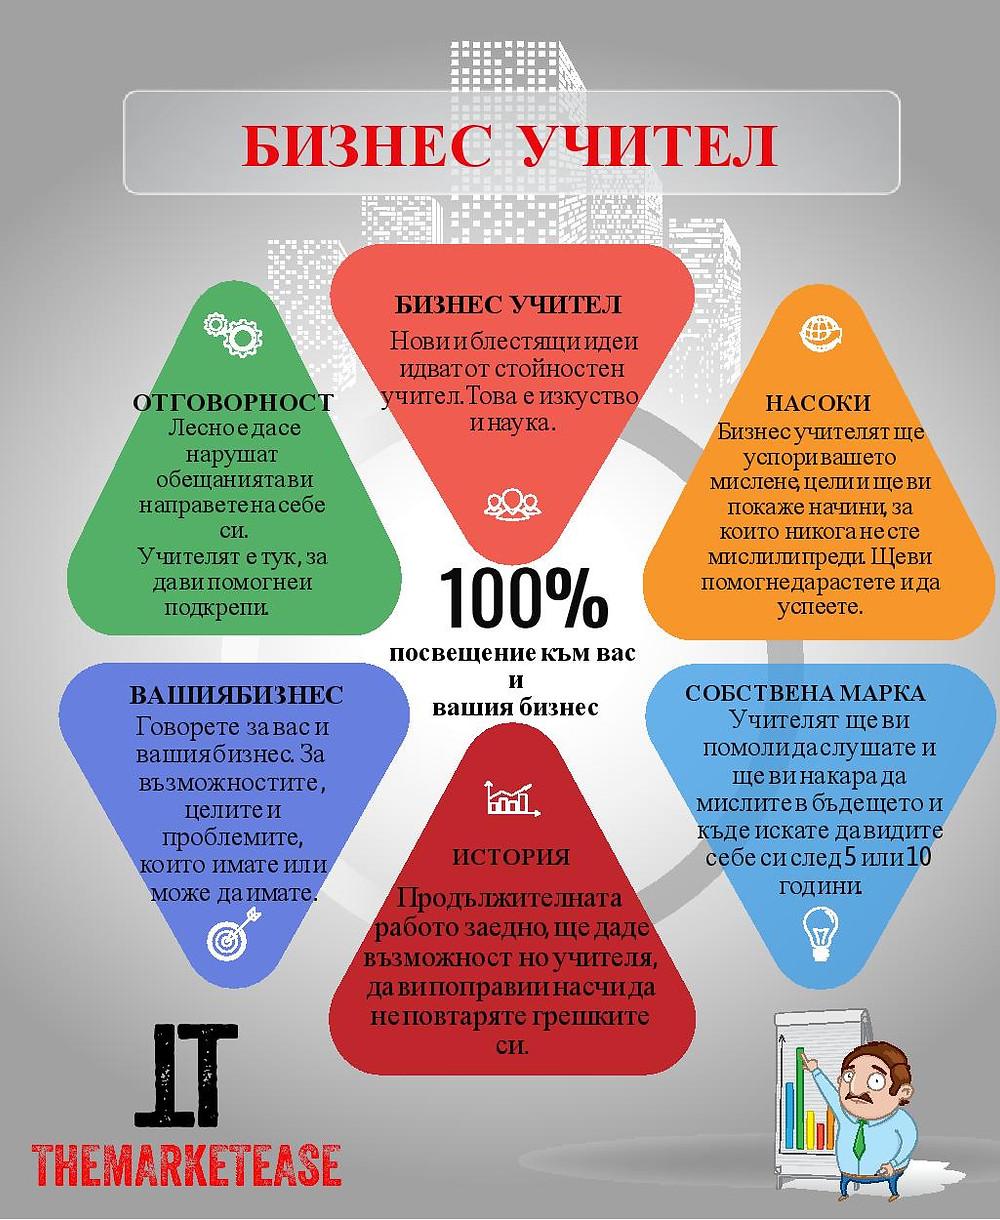 Business Consulting Bulgaria